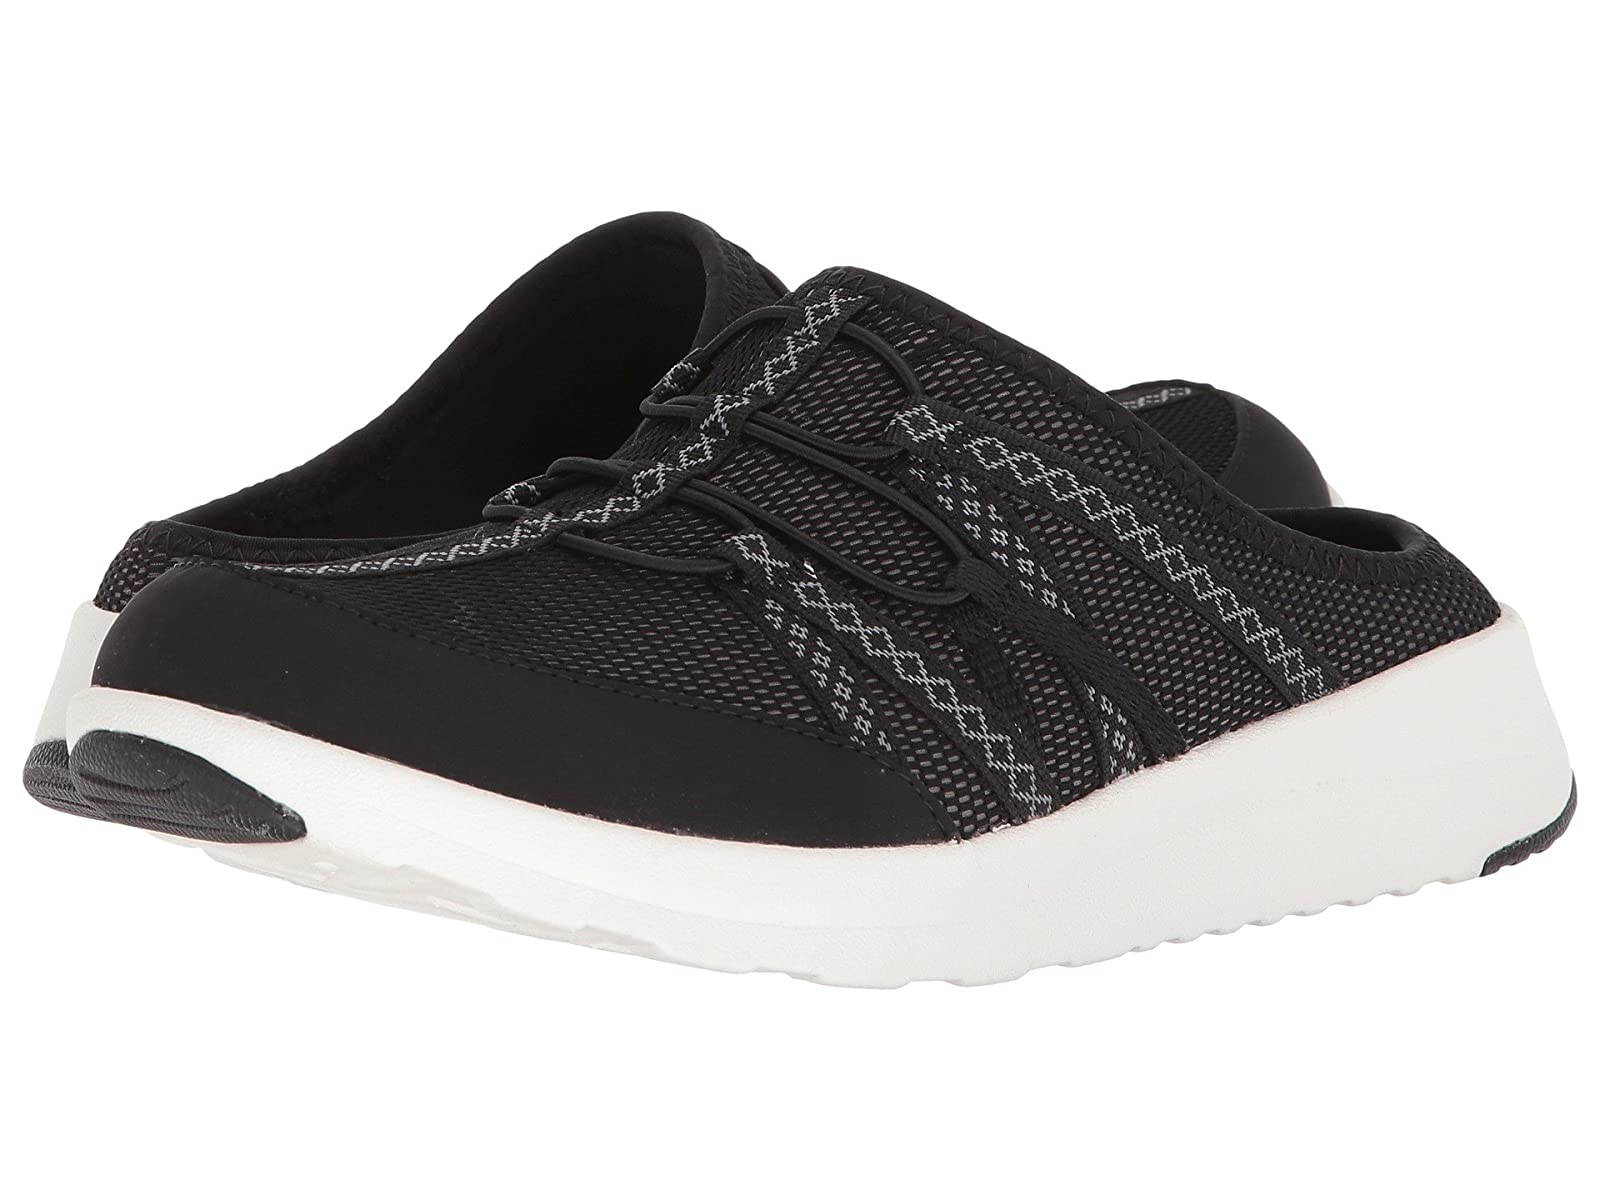 Clarks Darleigh MyraCheap and distinctive eye-catching shoes